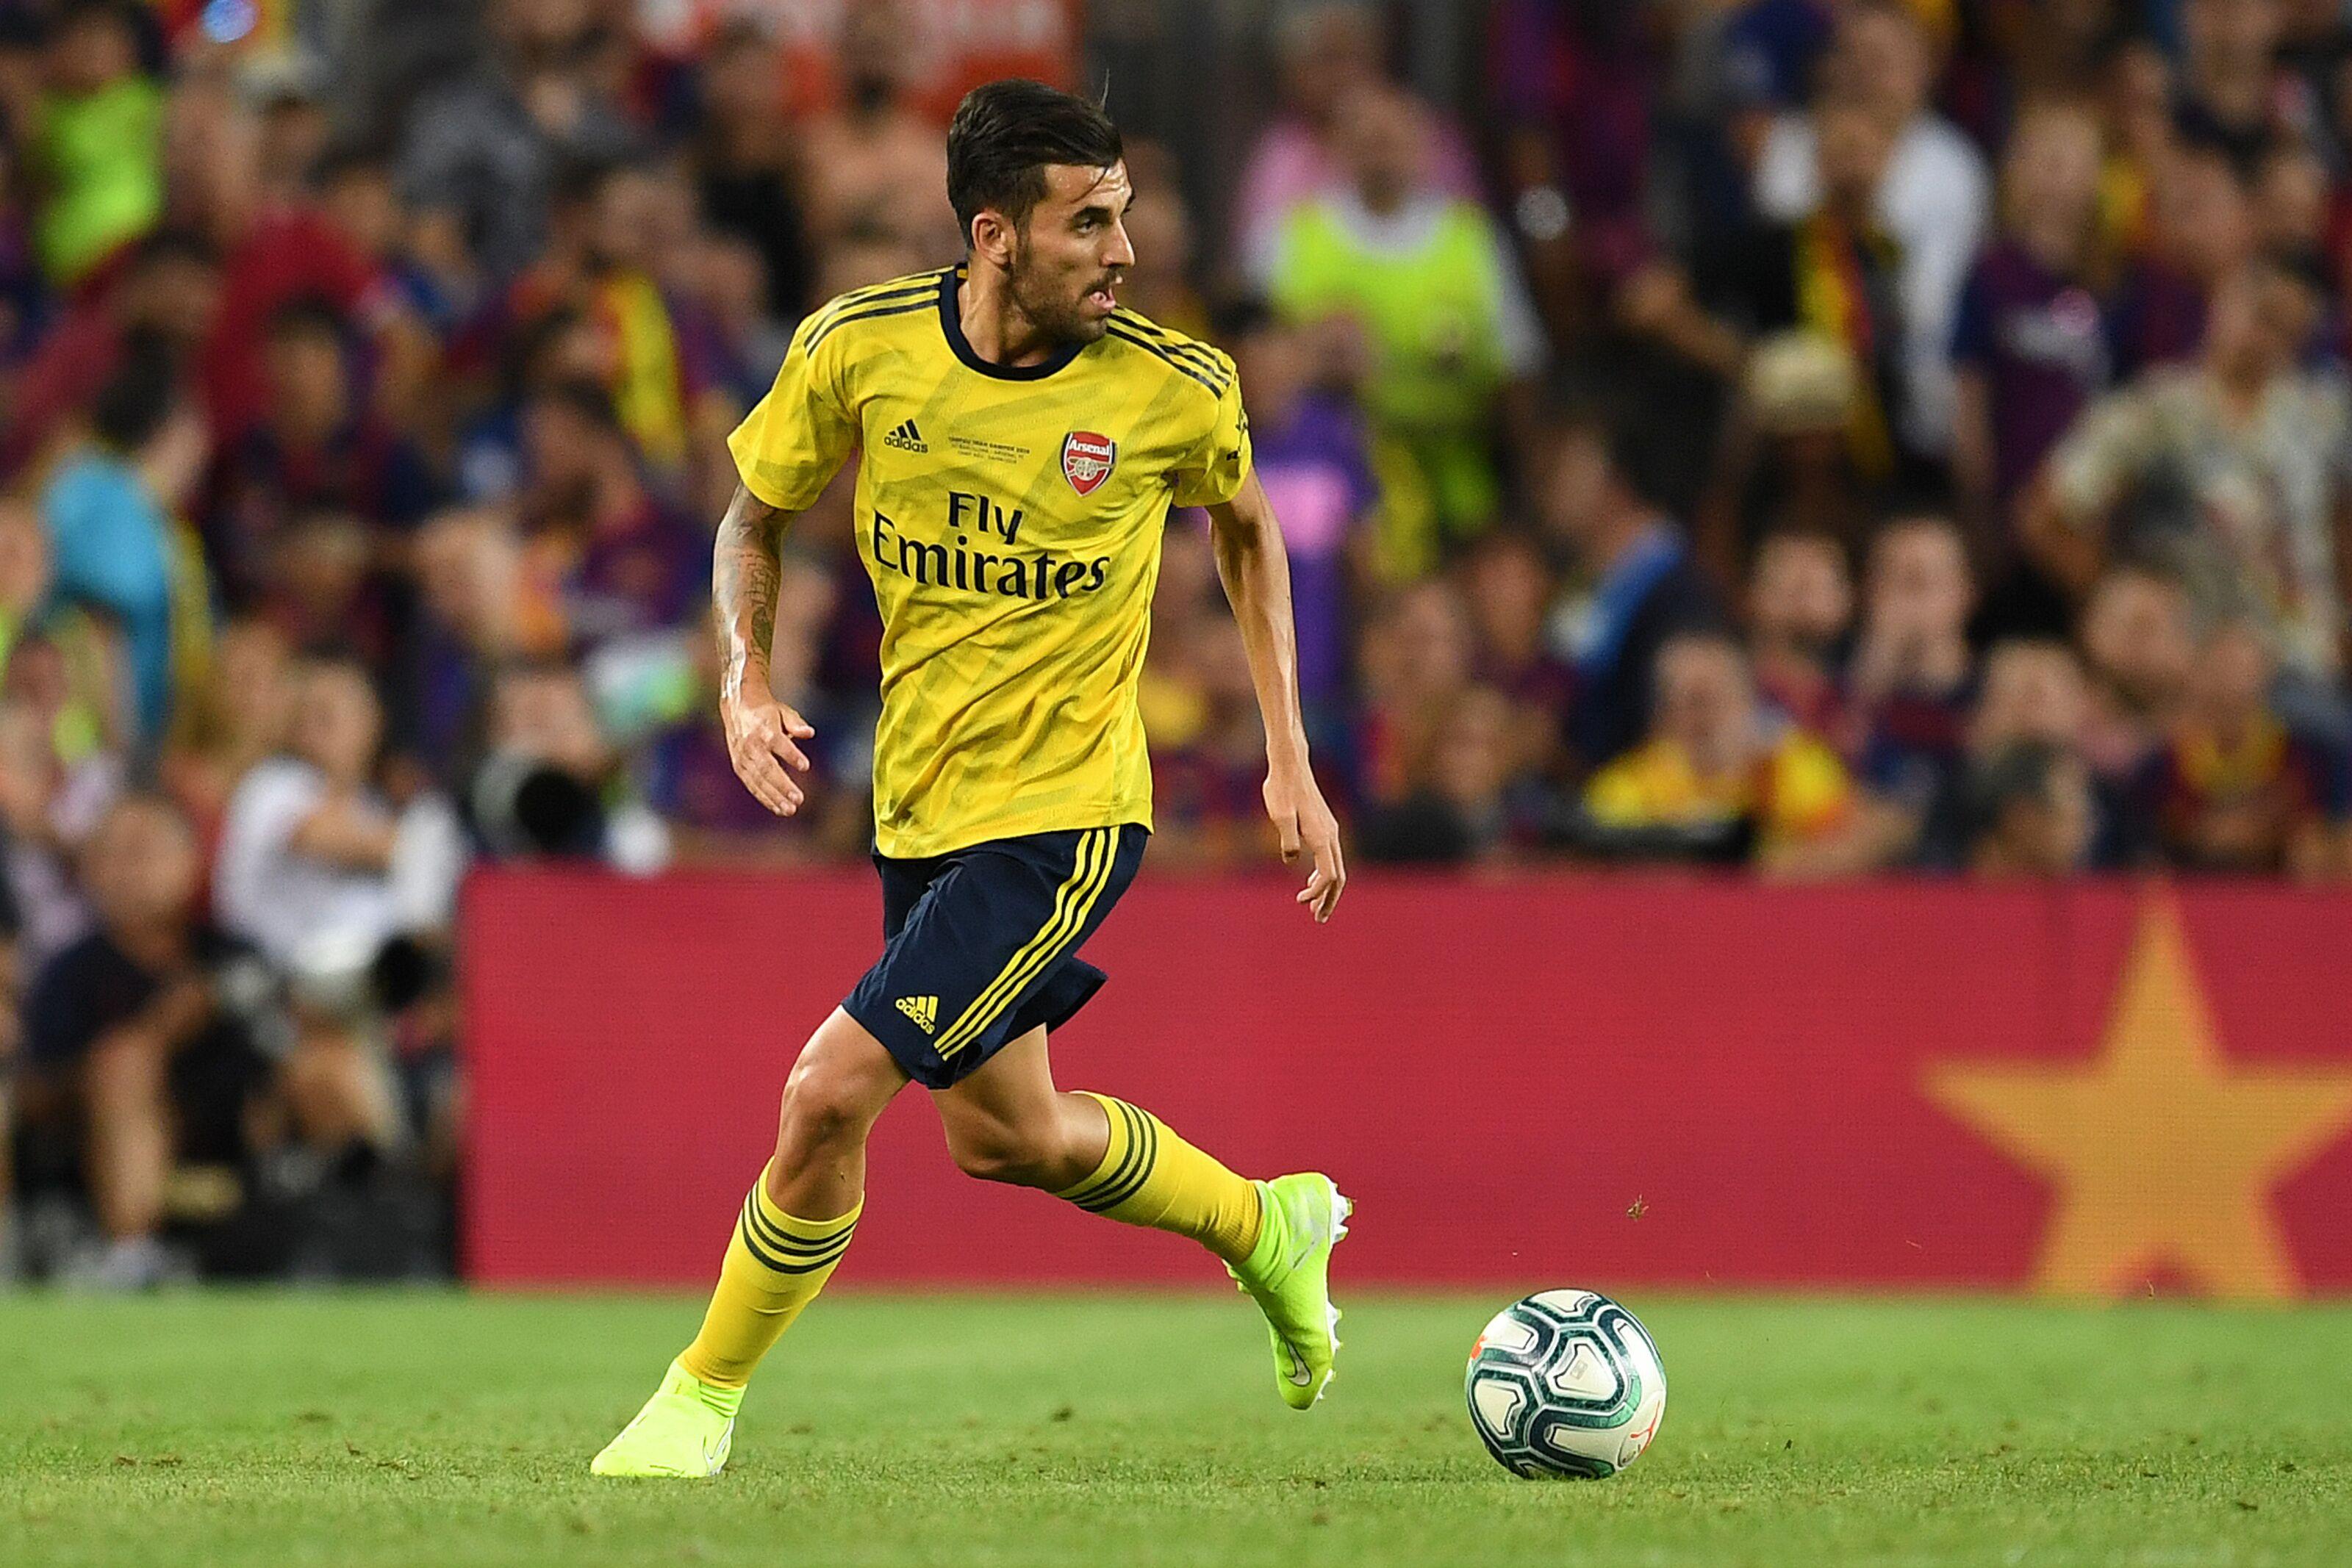 Arsenal: Dani Ceballos may hit harder than Nicolas Pepe